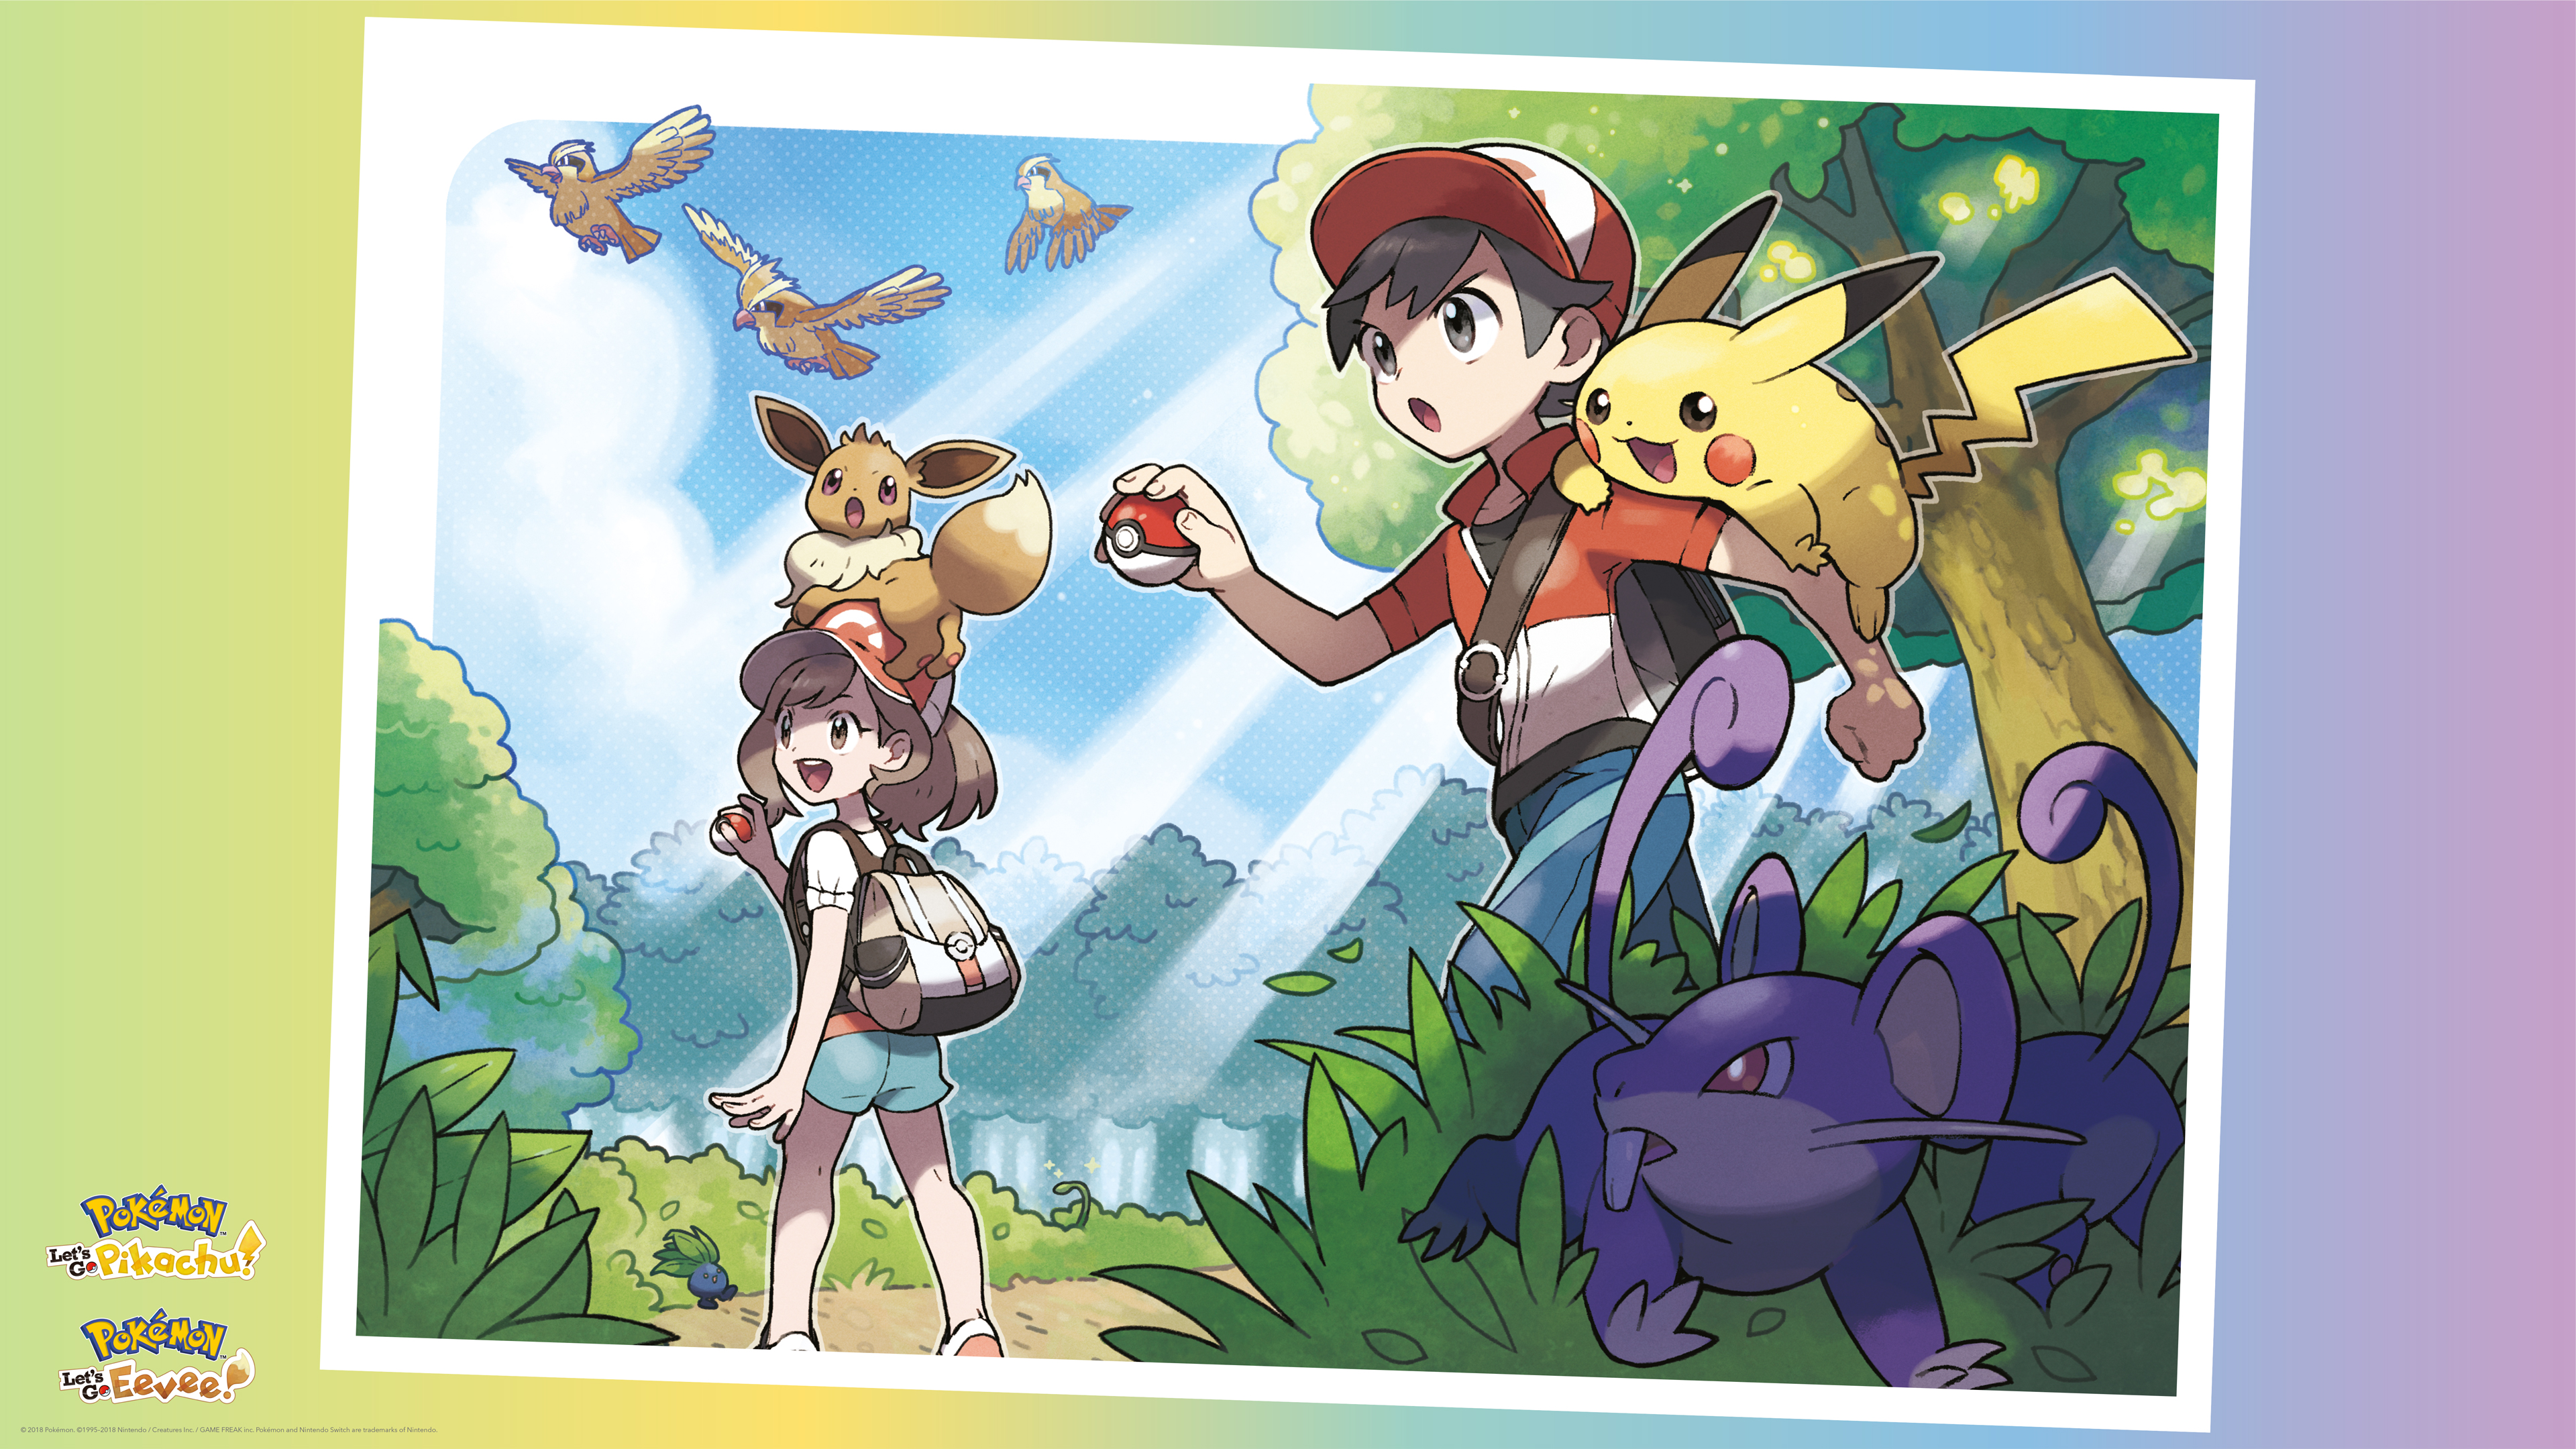 Pokémon, Pikachu, Eevee , Pokémon Lets Go Eevee, Chase , HD Wallpaper & Backgrounds